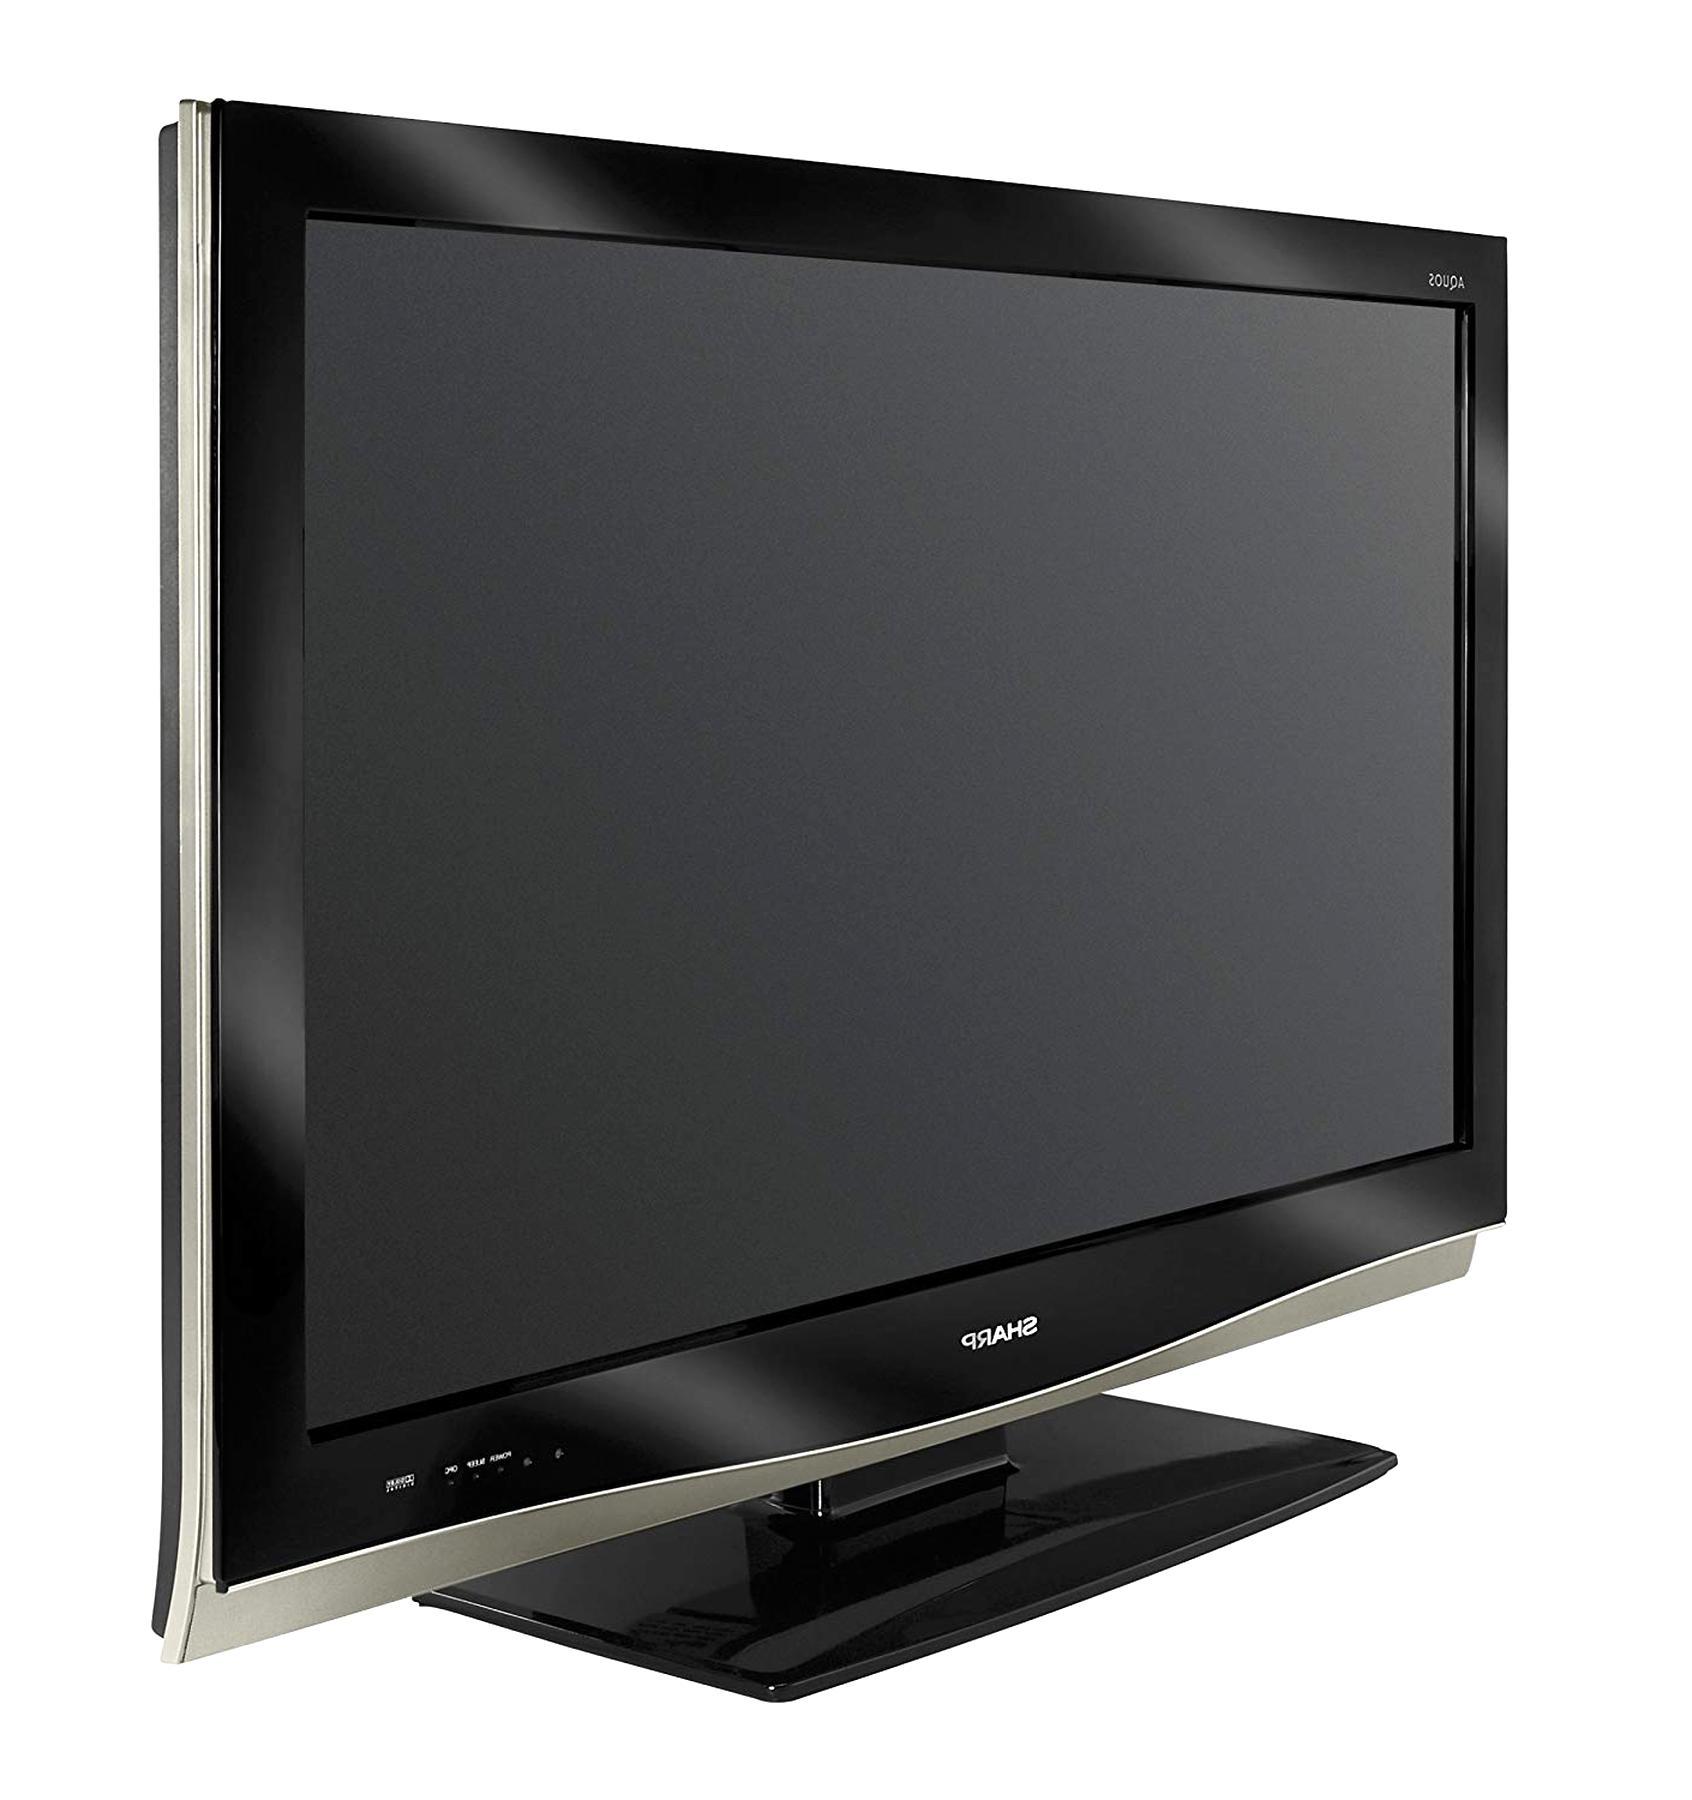 sharp aquos tv lcd d'occasion